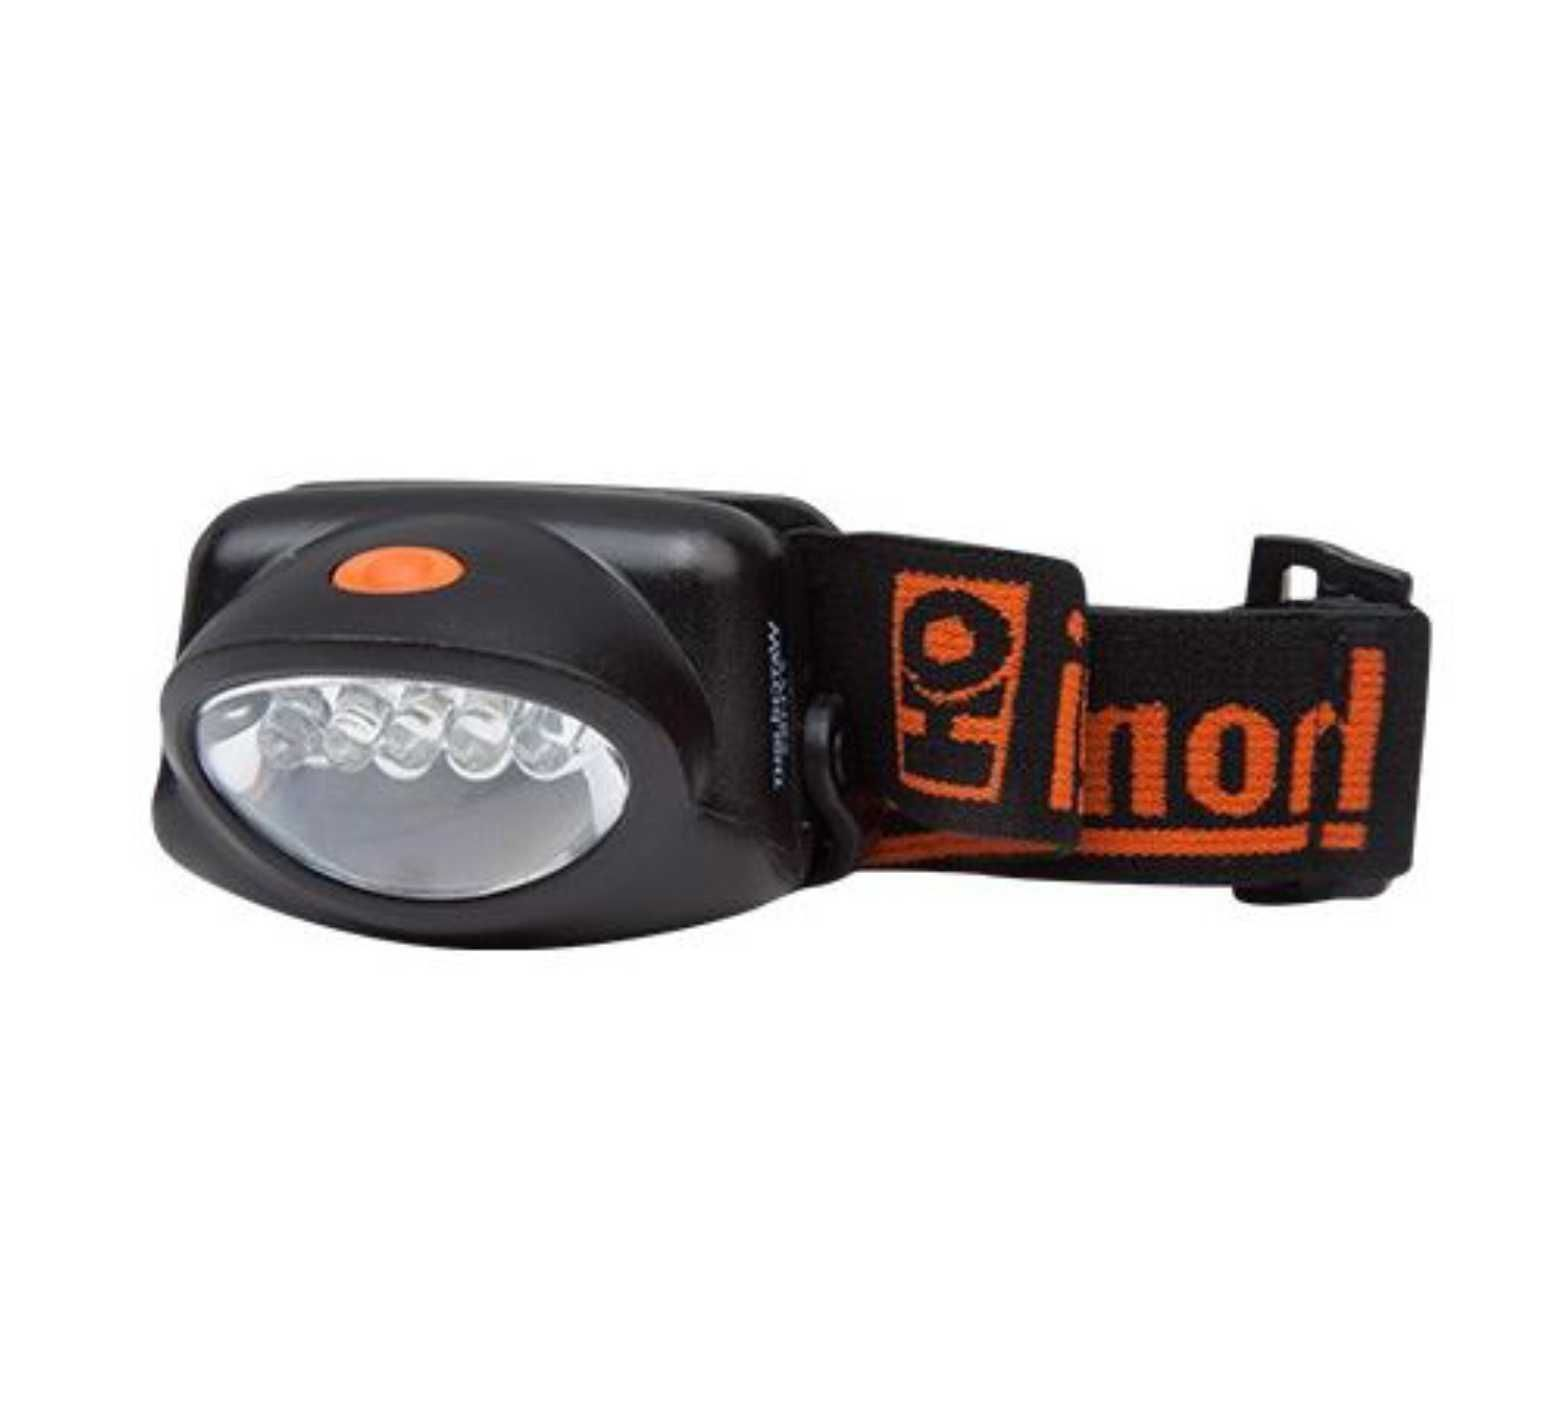 HM LED hoofdlamp 77H82 € 11.98